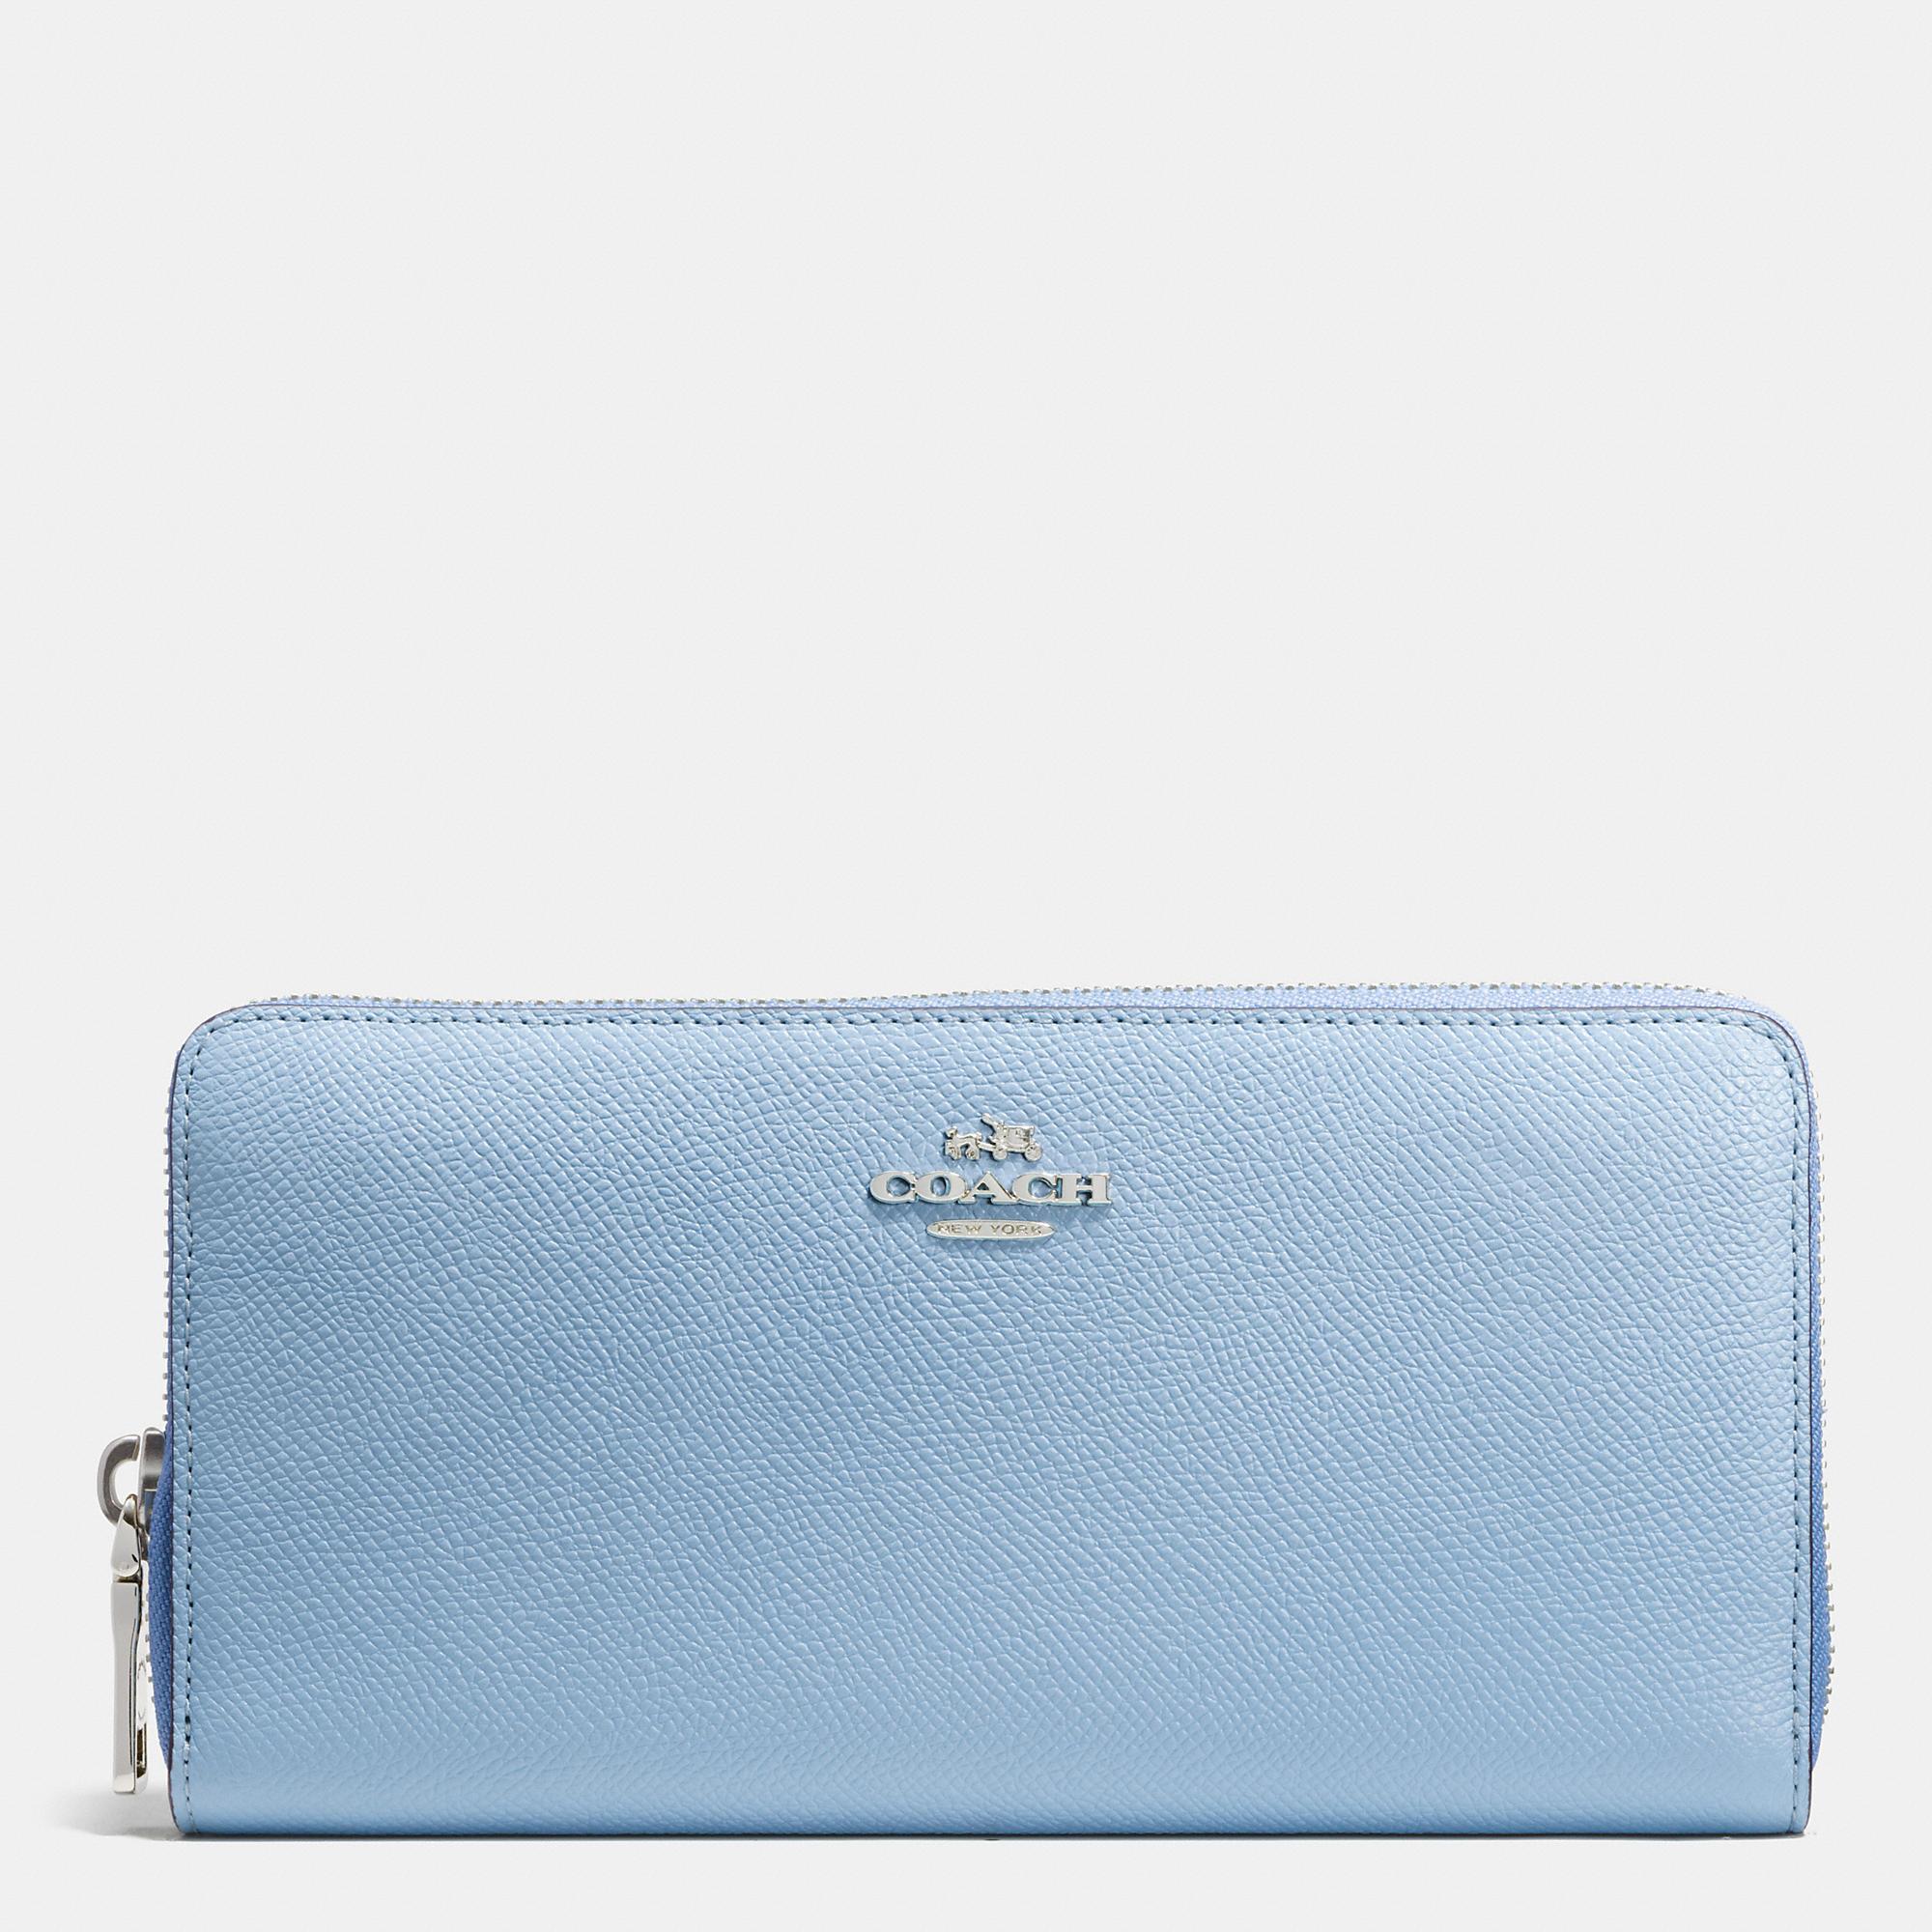 3061cbcb58 COACH Blue Accordion Zip Wallet In Colorblock Crossgrain Leather